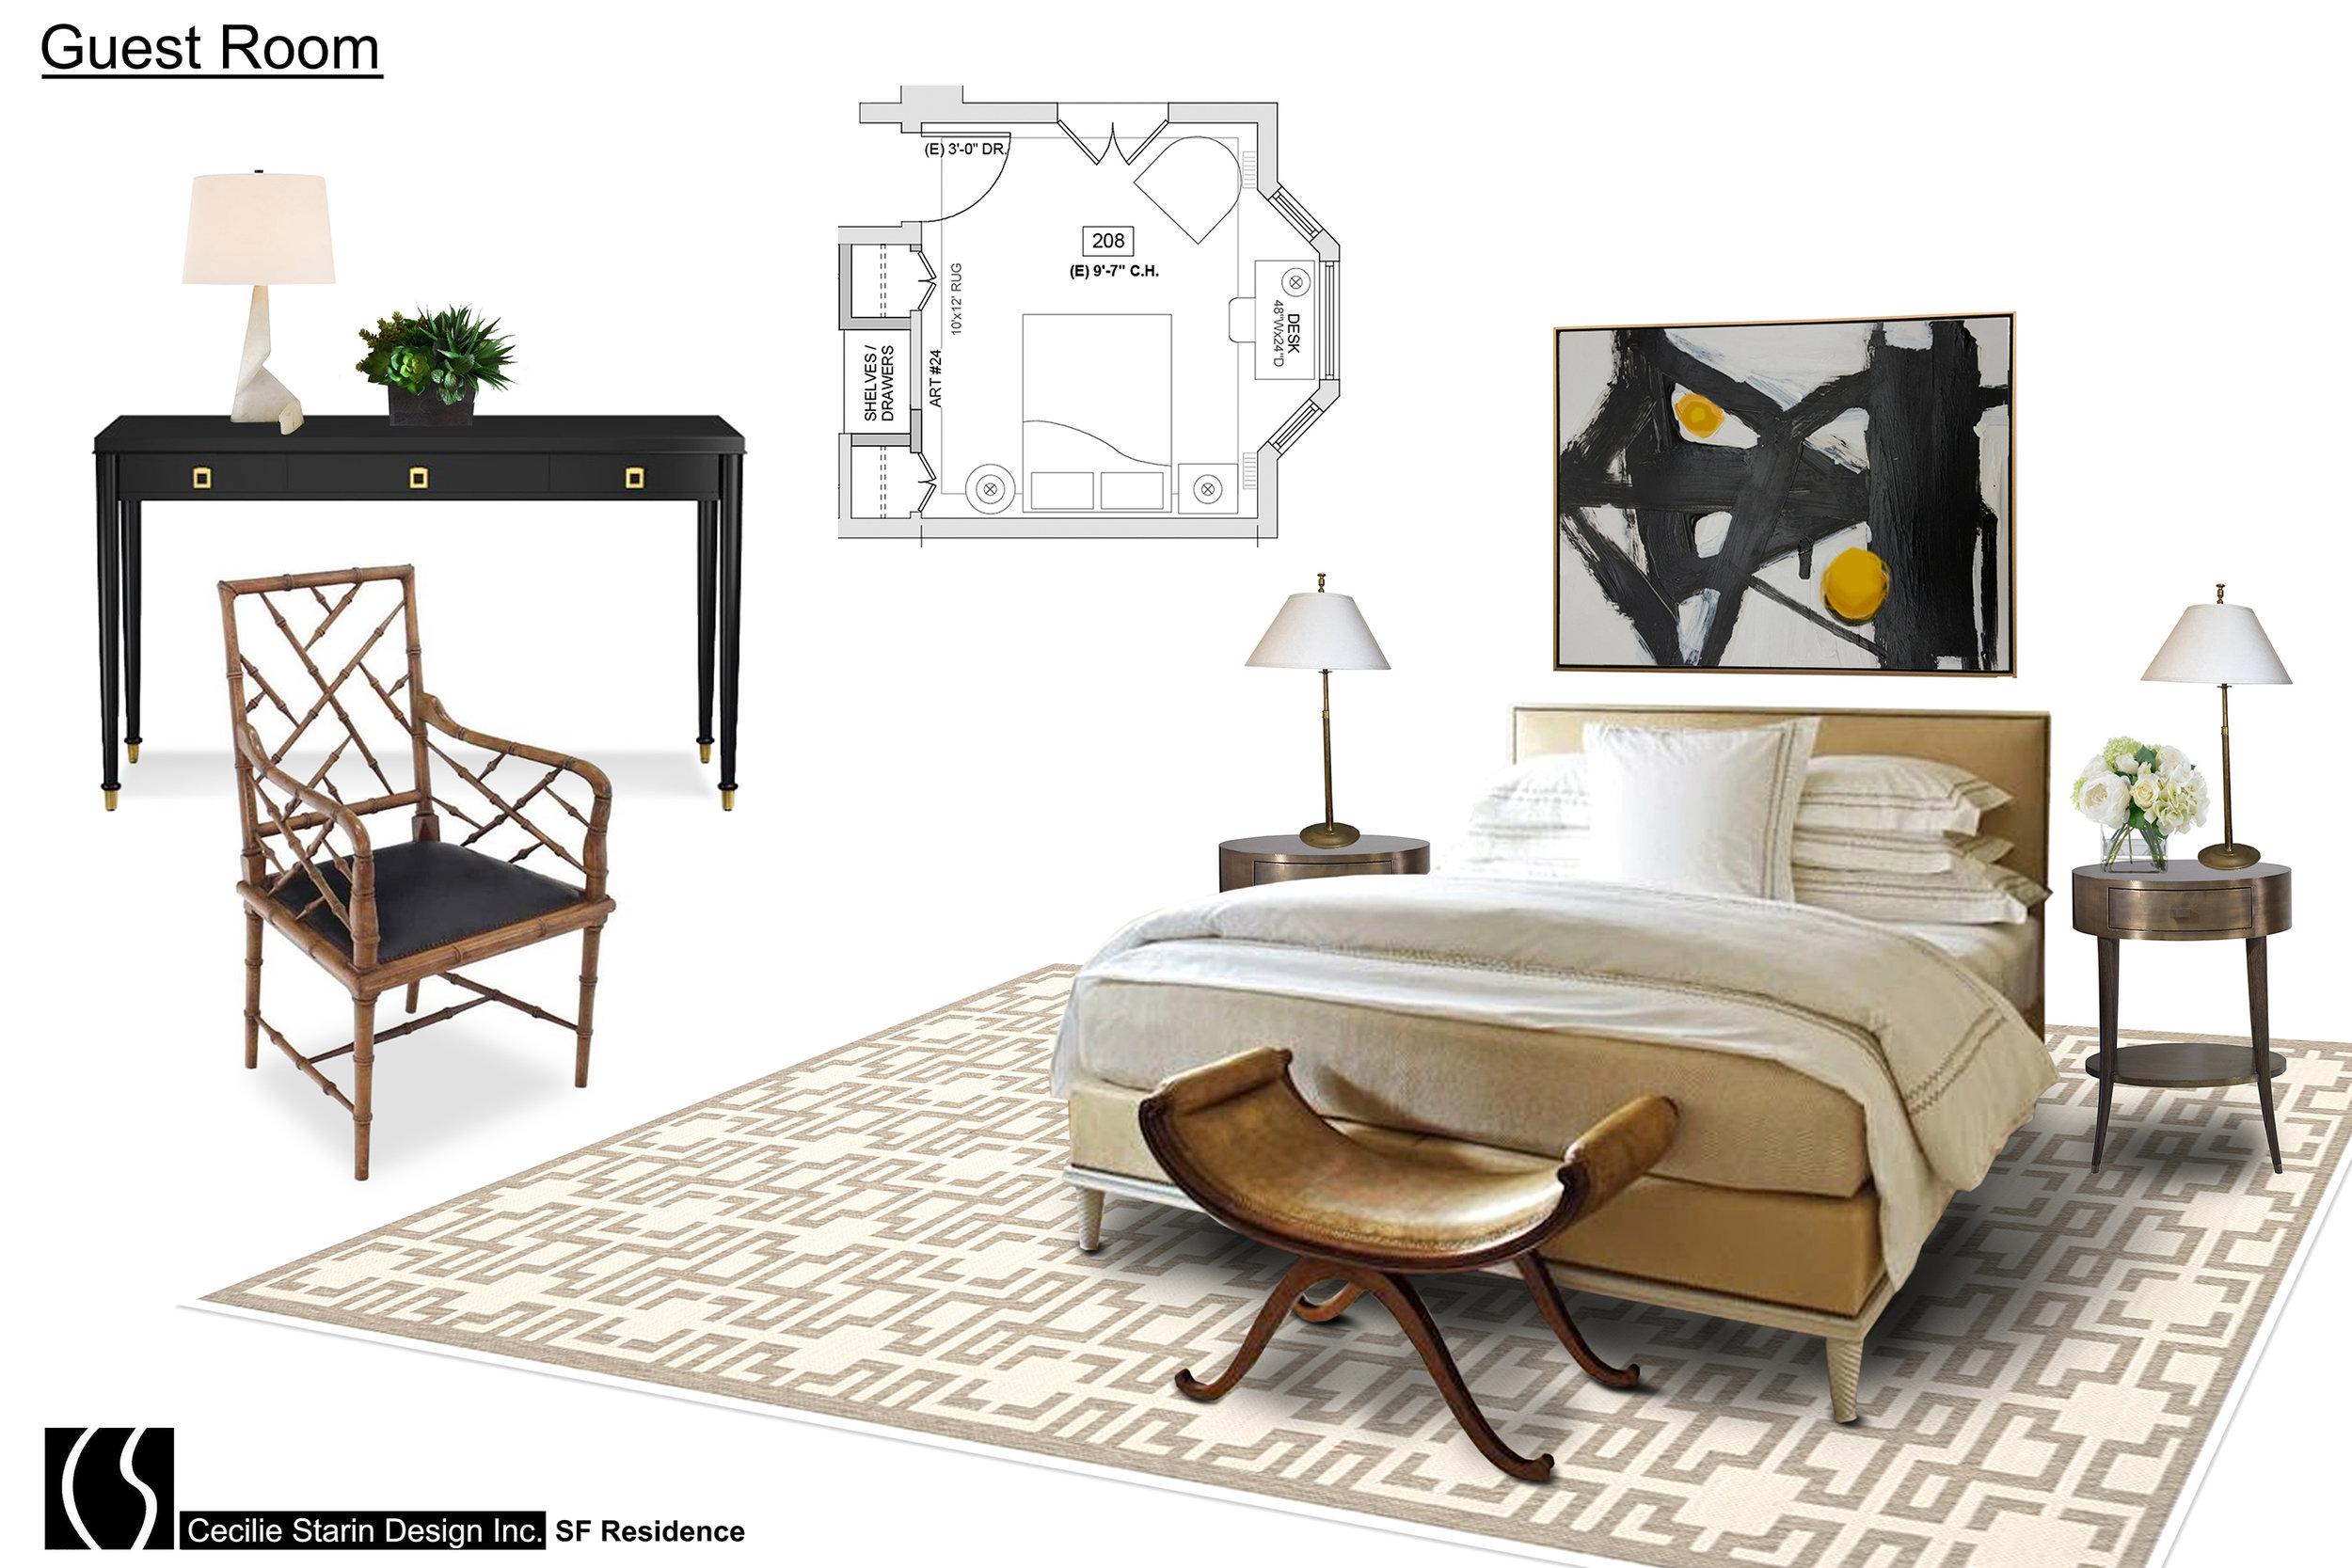 SF Residence Guest Room 18x12.jpg